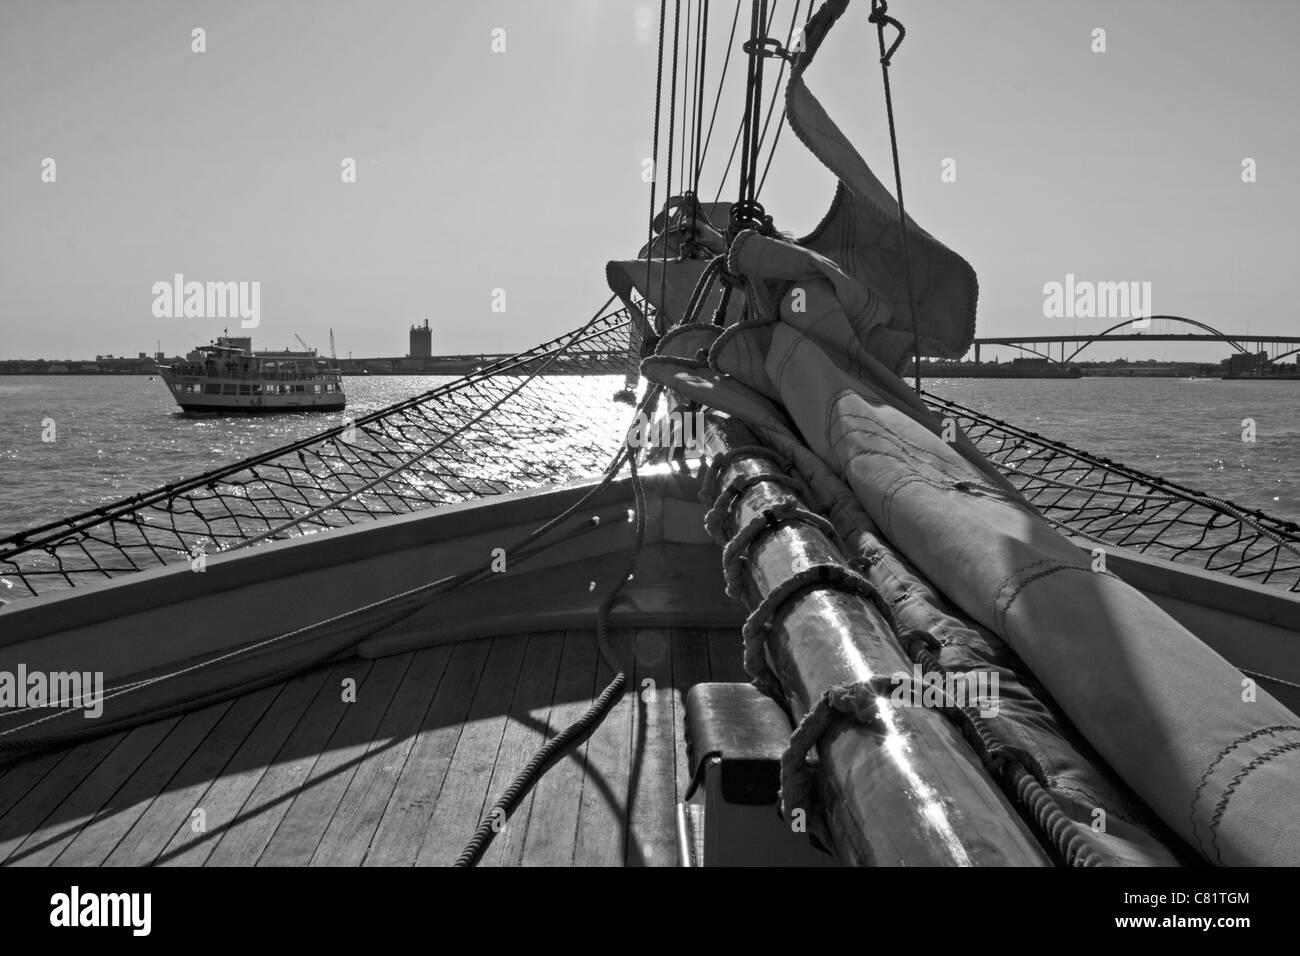 The S/V Denis Sullivan sails on Lake Michigan in Milwaukee's harbor. - Stock Image